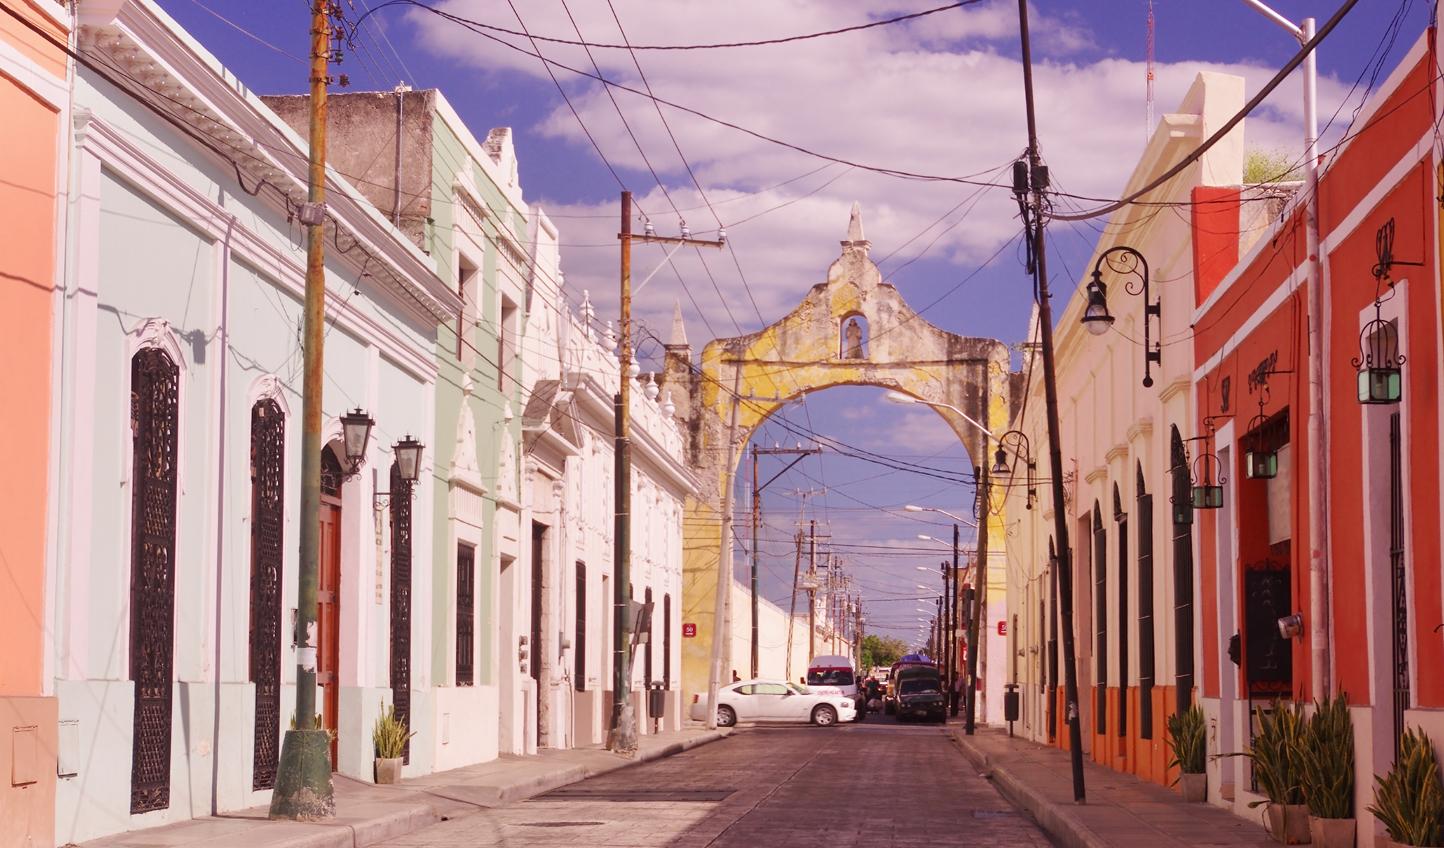 Stroll through Merida's charming streets